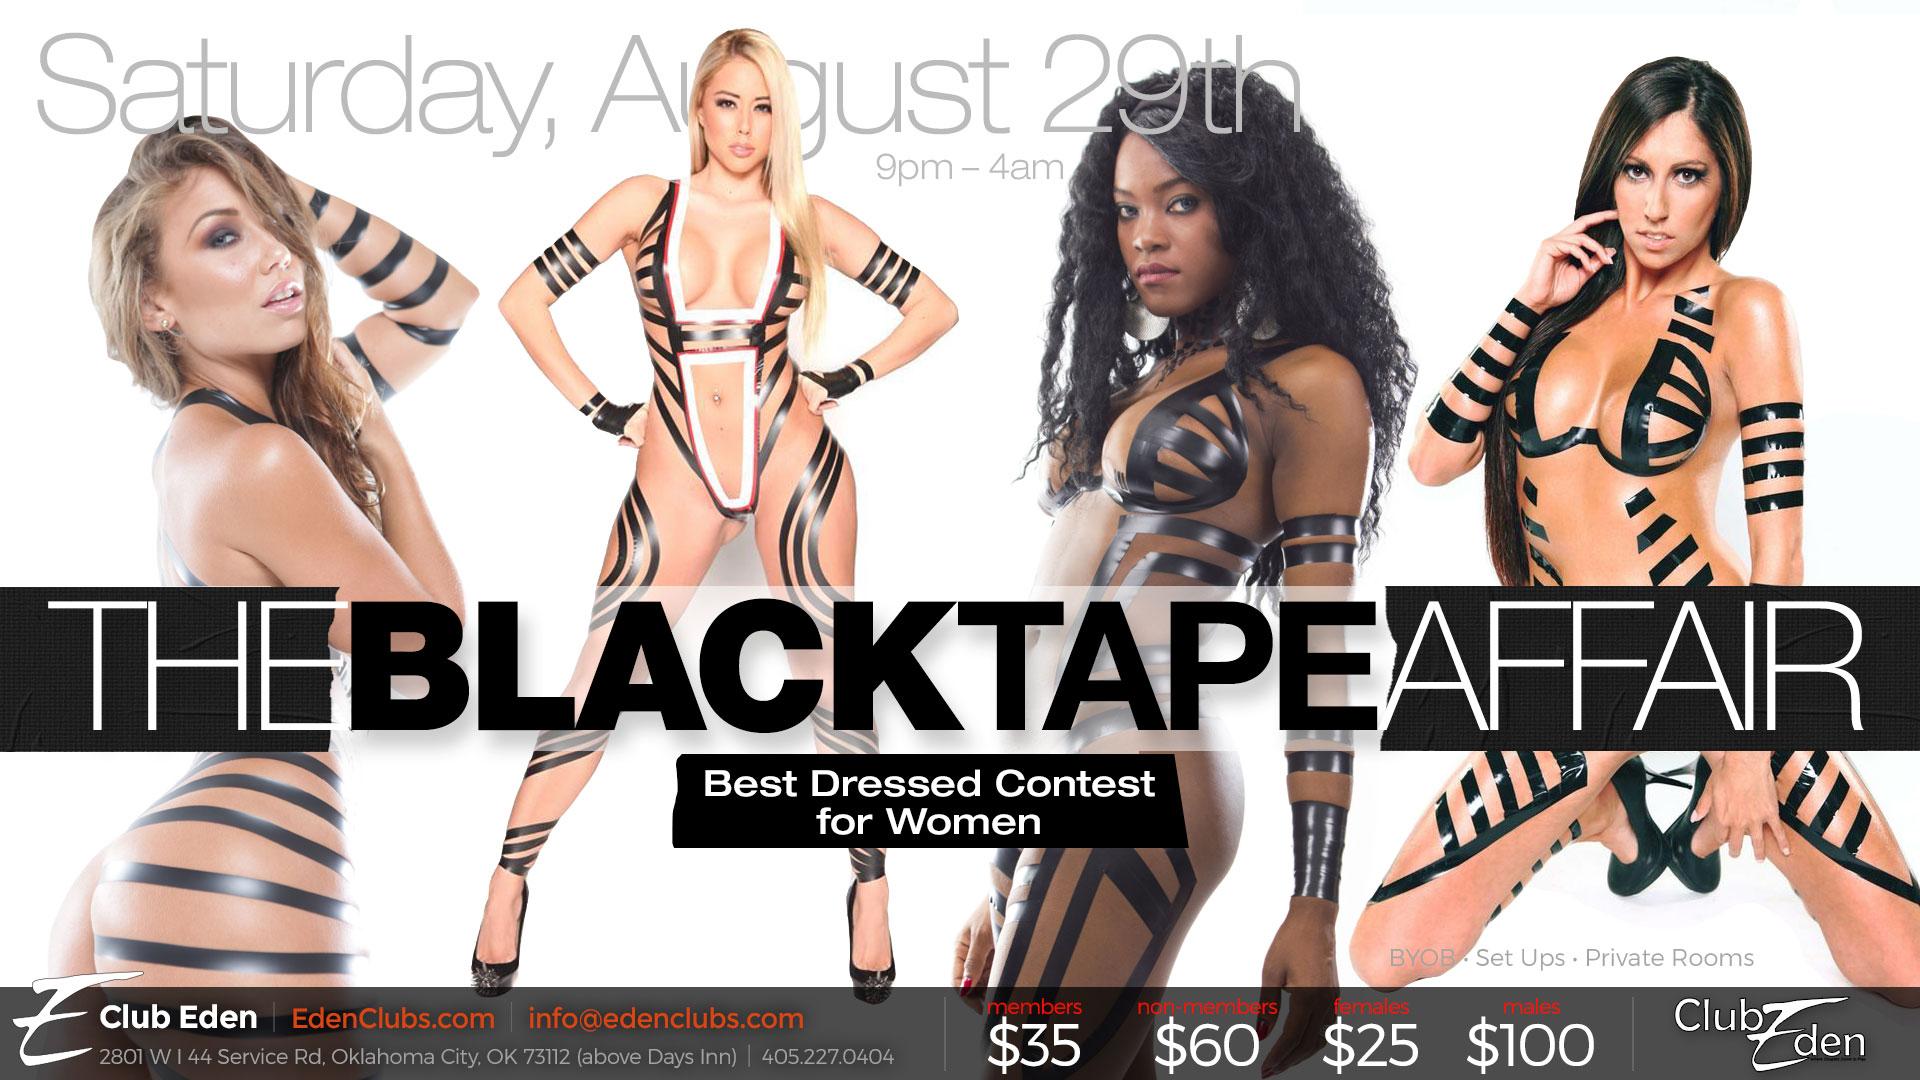 082920-OKC-Black-Tape-tv